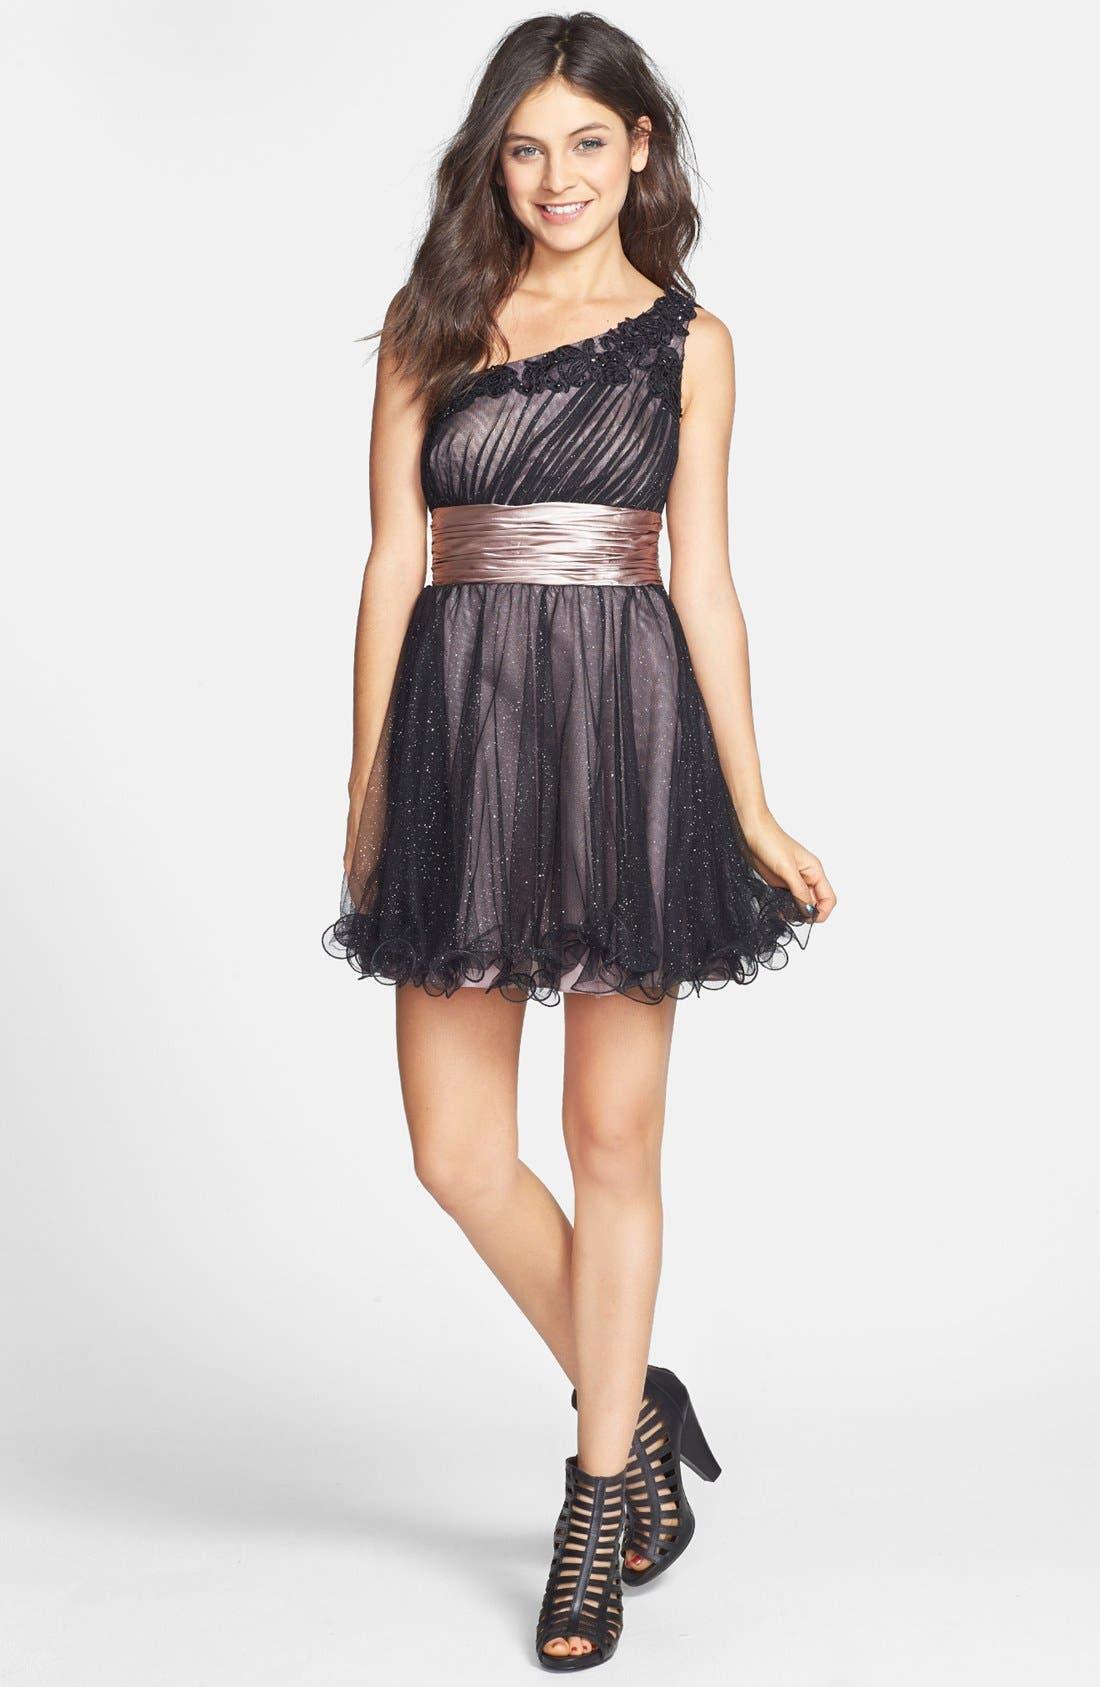 Alternate Image 1 Selected - Jump Apparel One-Shoulder Dress (Juniors)